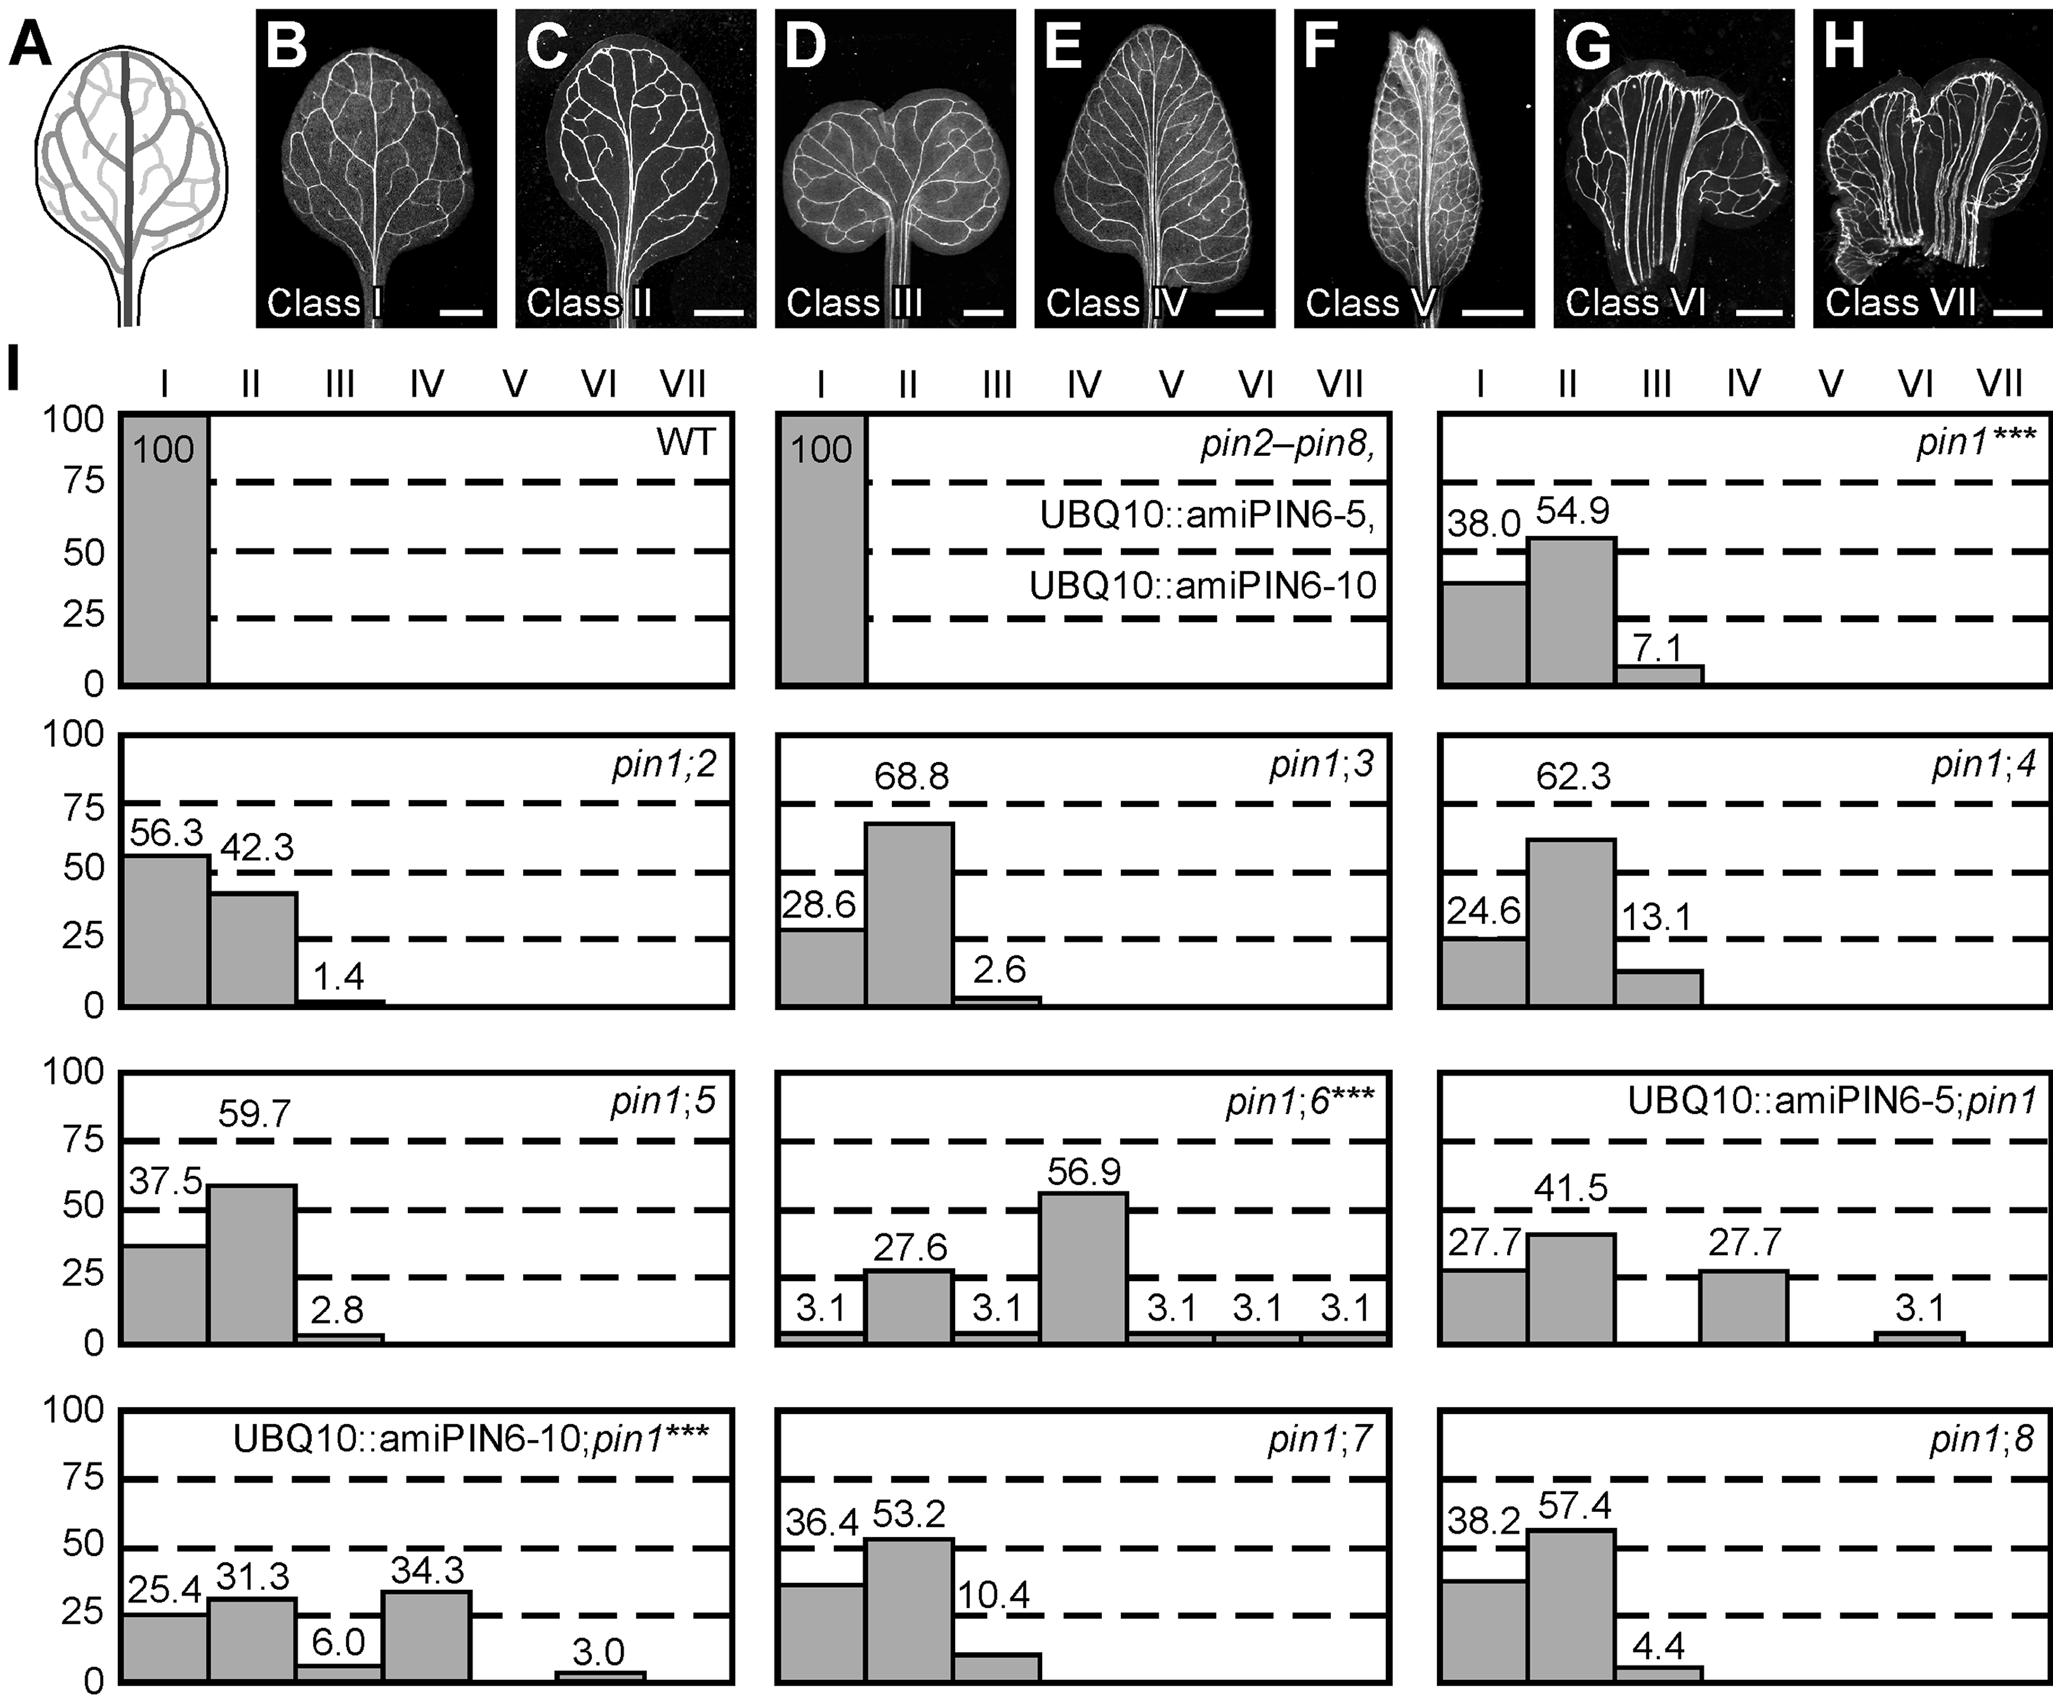 Vein patterning functions of Arabidopsis <i>PIN</i> genes.